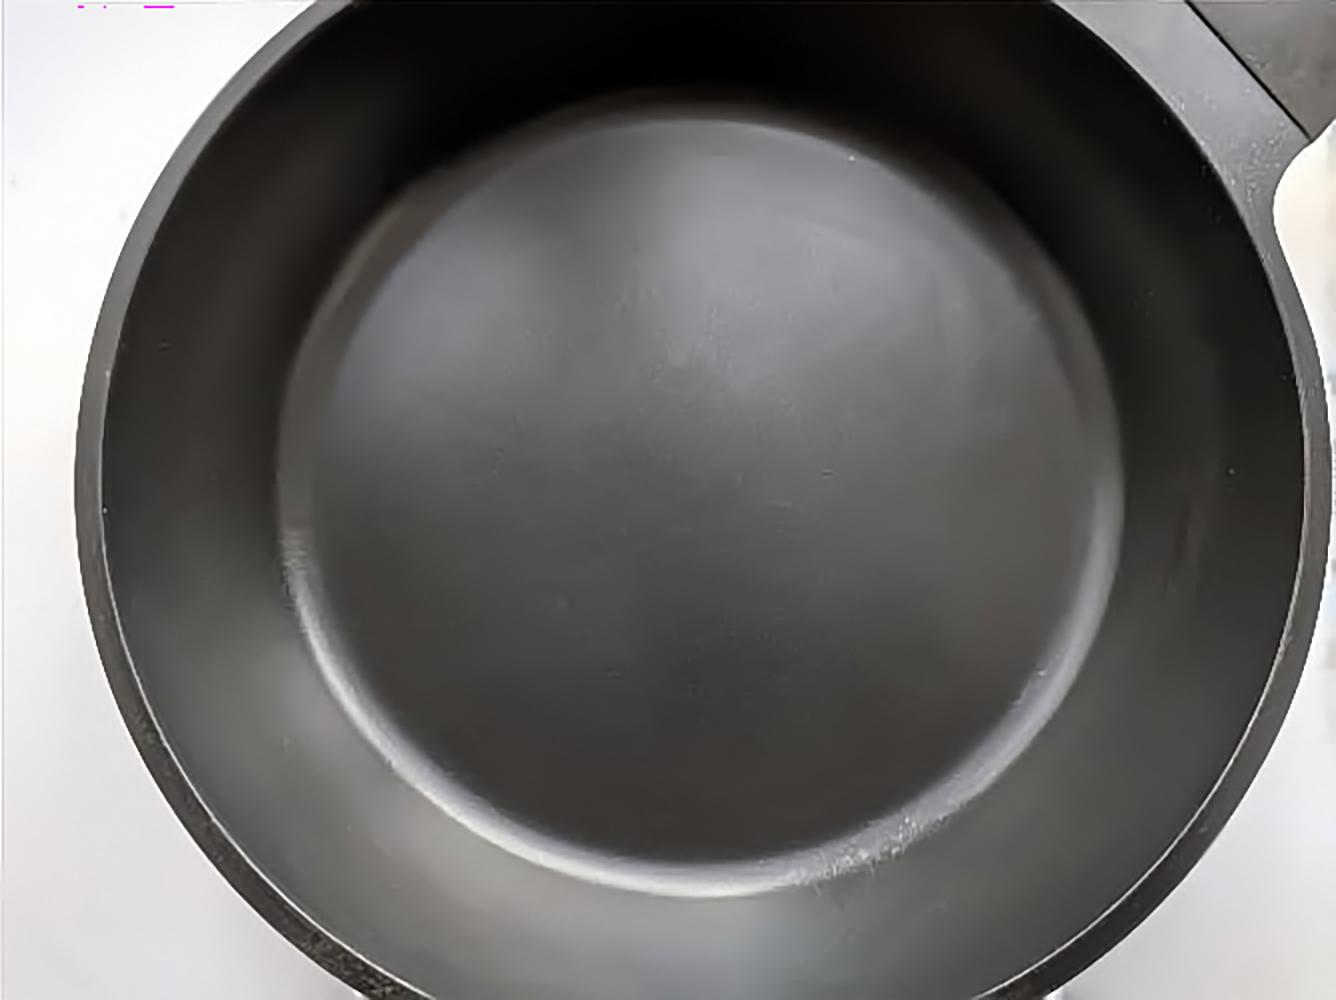 CковородкиPolaris впечатляют... Обзор сковородок Polaris Bellagio-24F и Polaris Safari 24F